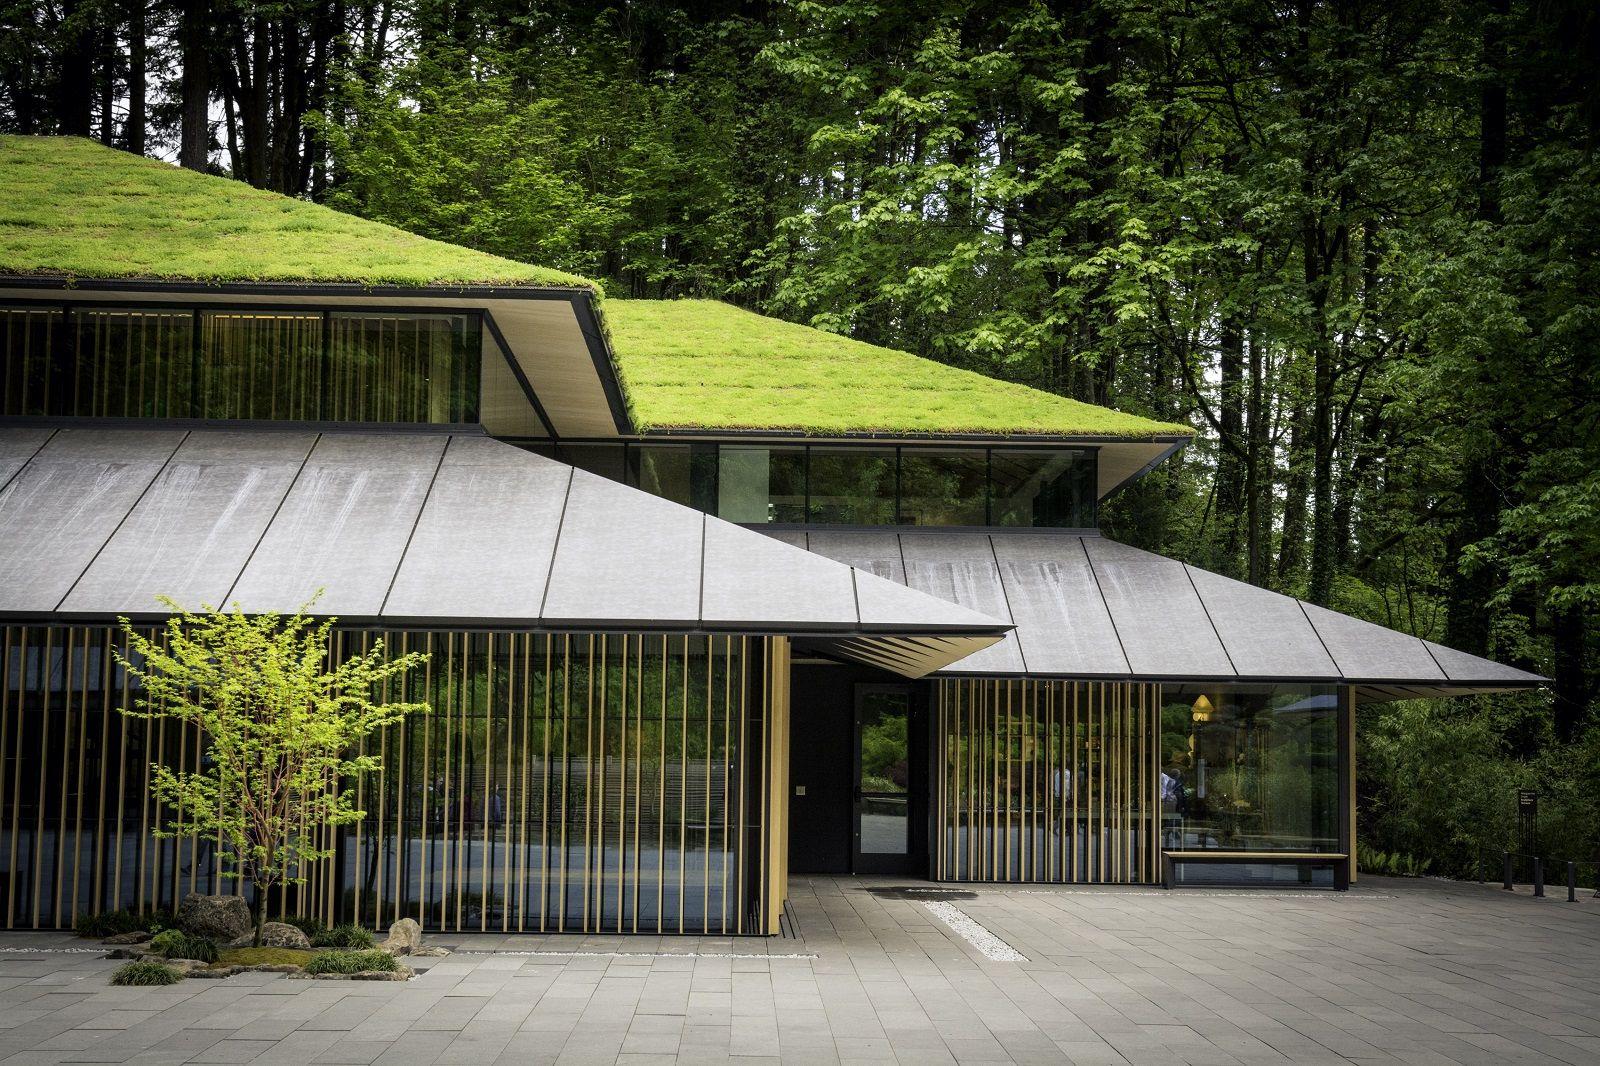 Jordan Schnitzer Japanese Arts Learning Center Garden Architecture Japanese Architect Portland Japanese Garden